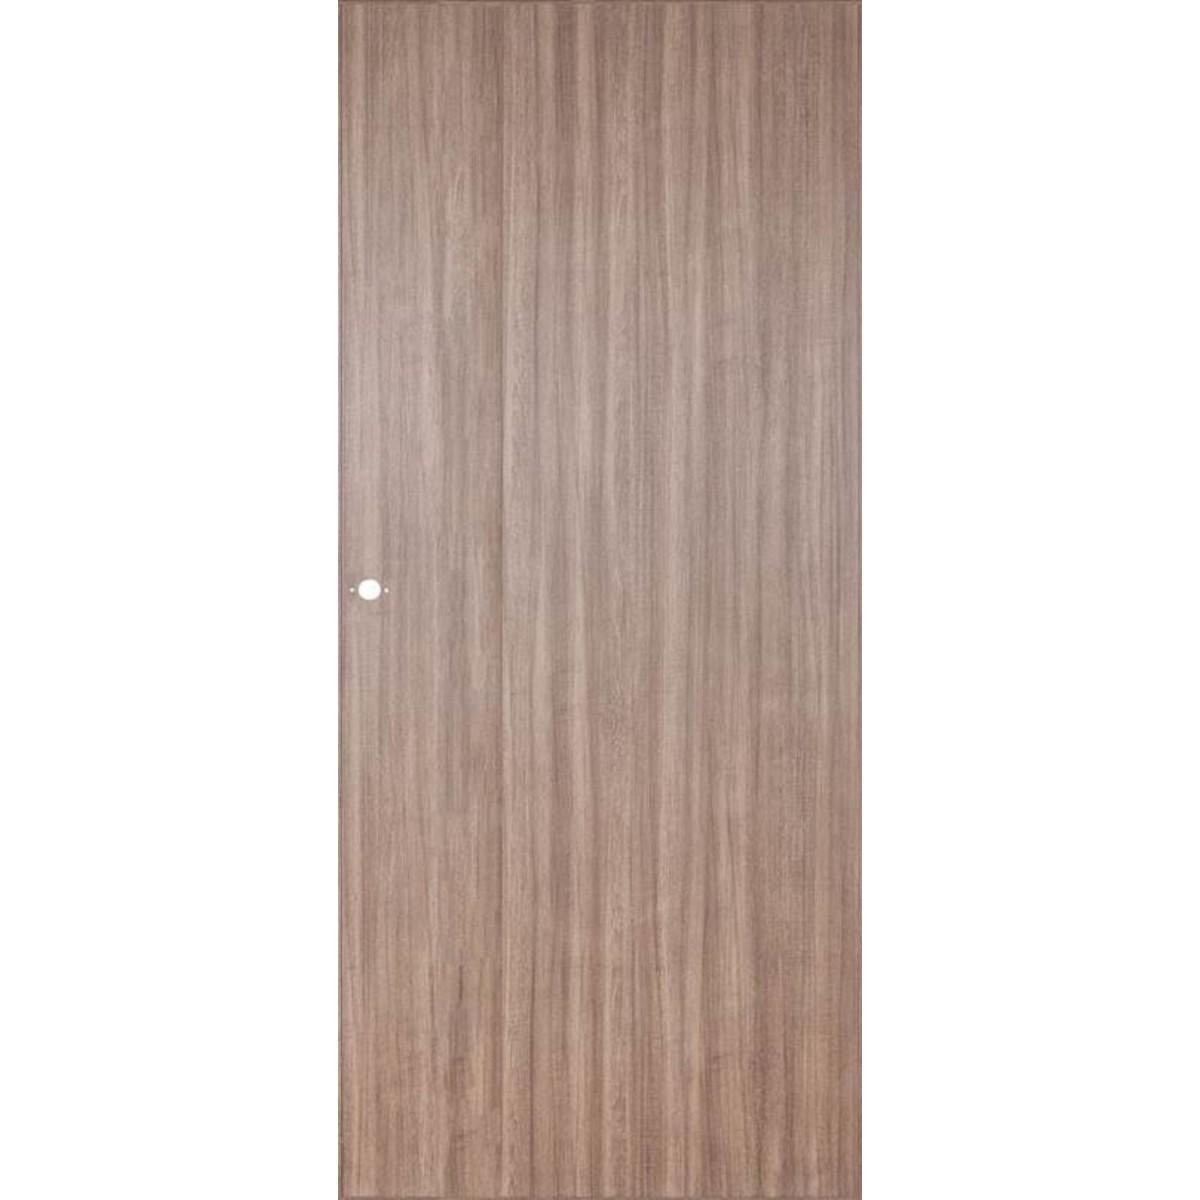 Дверь Межкомнатная Глухая Селена 90x200 Цвет Орех